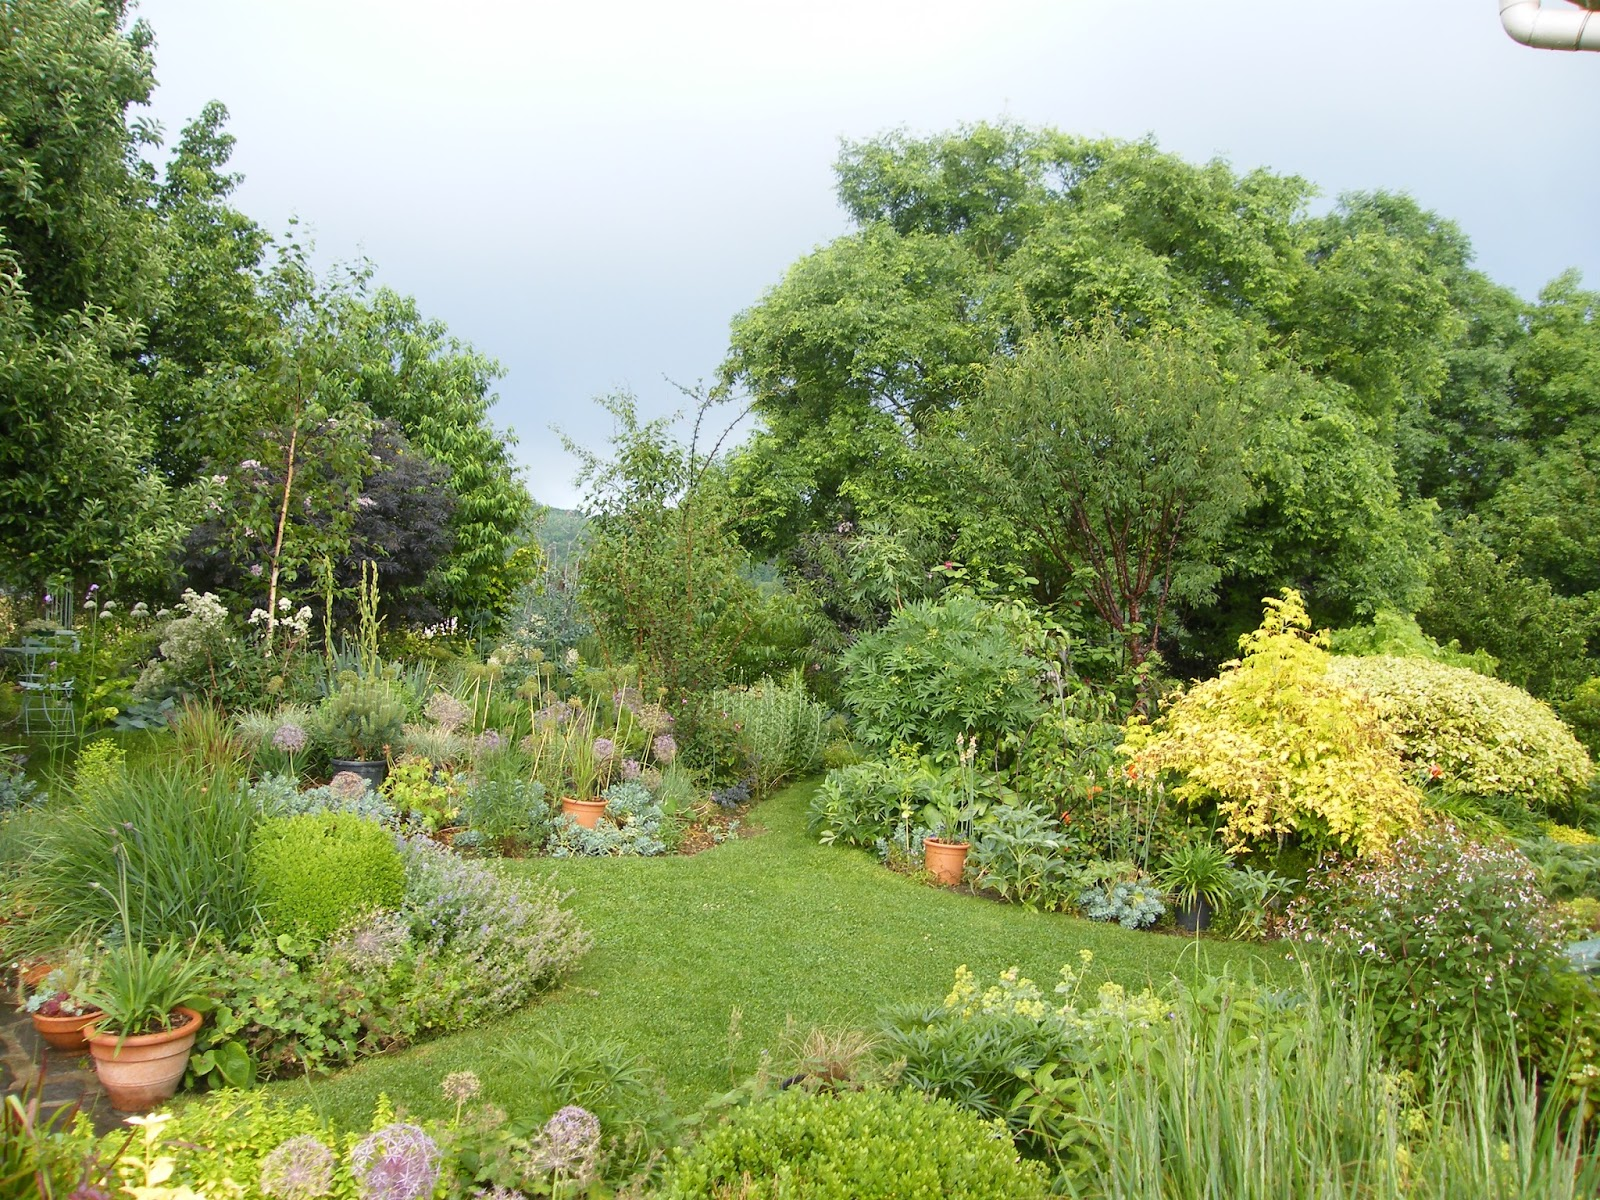 Au gr du jardin un jardin crin en auvergne for Au jardin